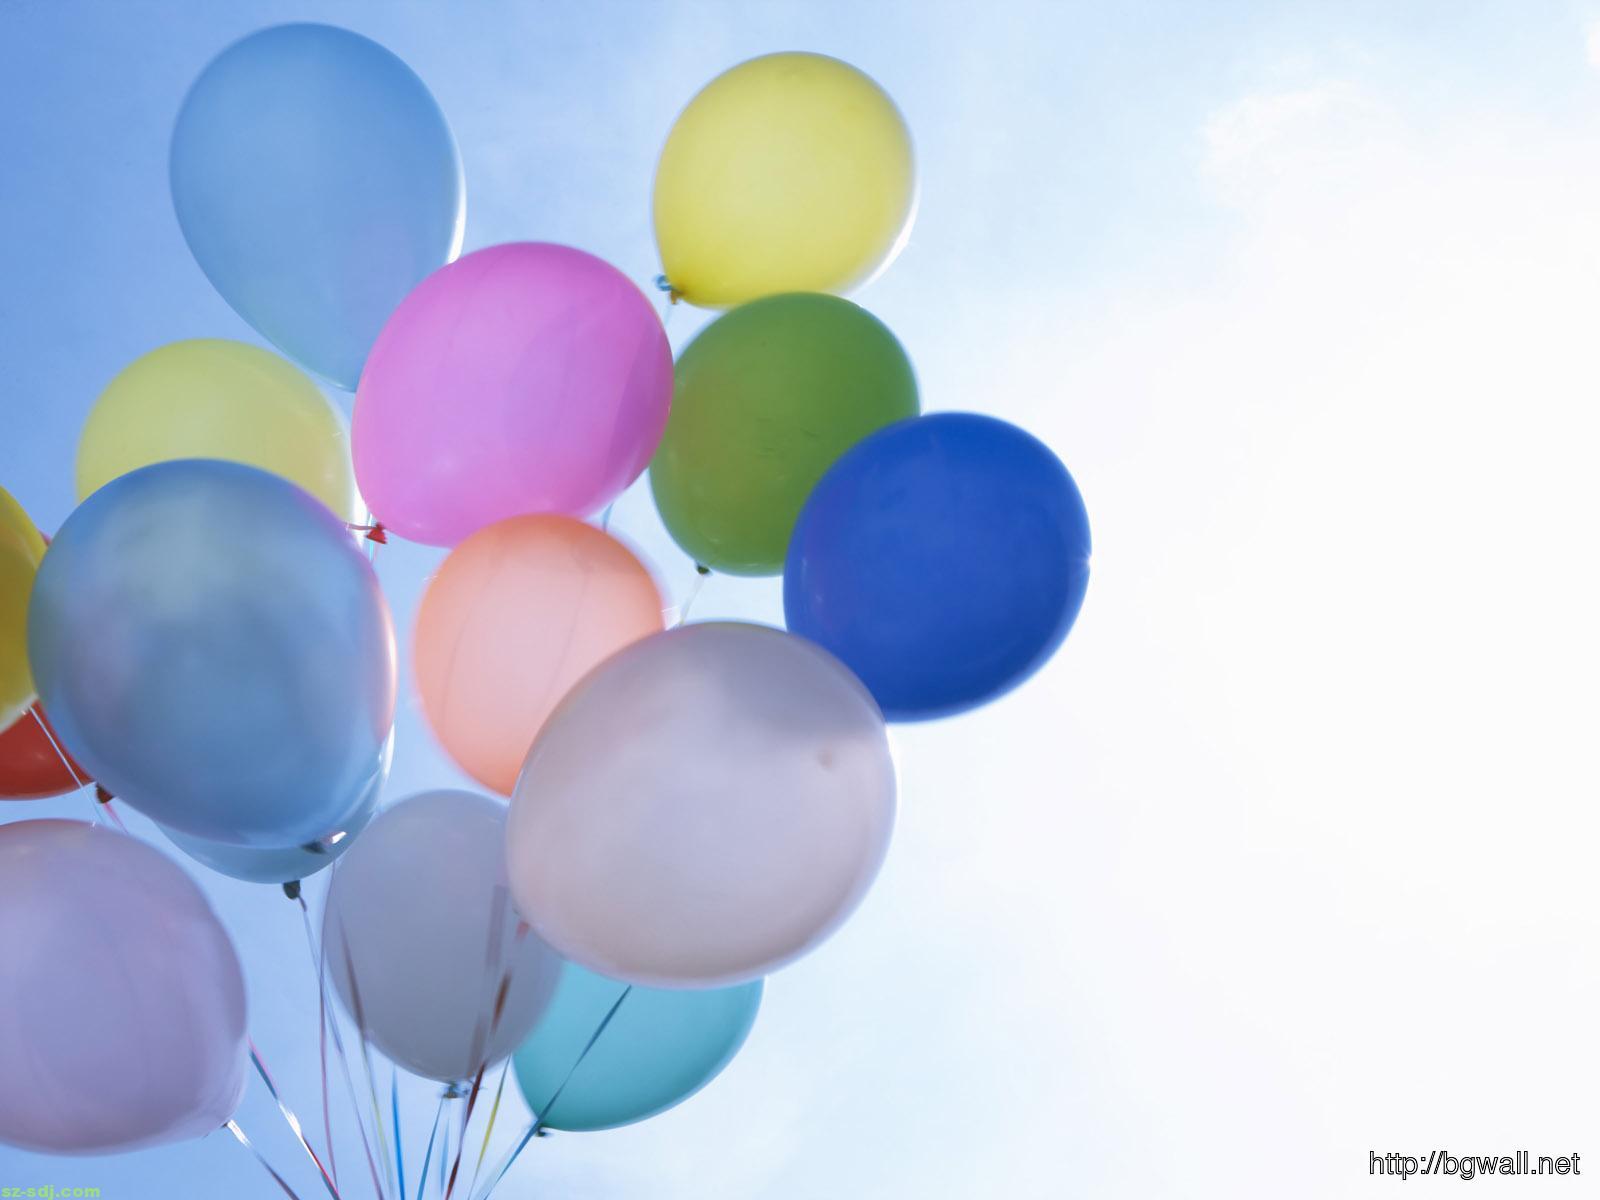 beautiful-birthday-balloon-wallpaper-hd